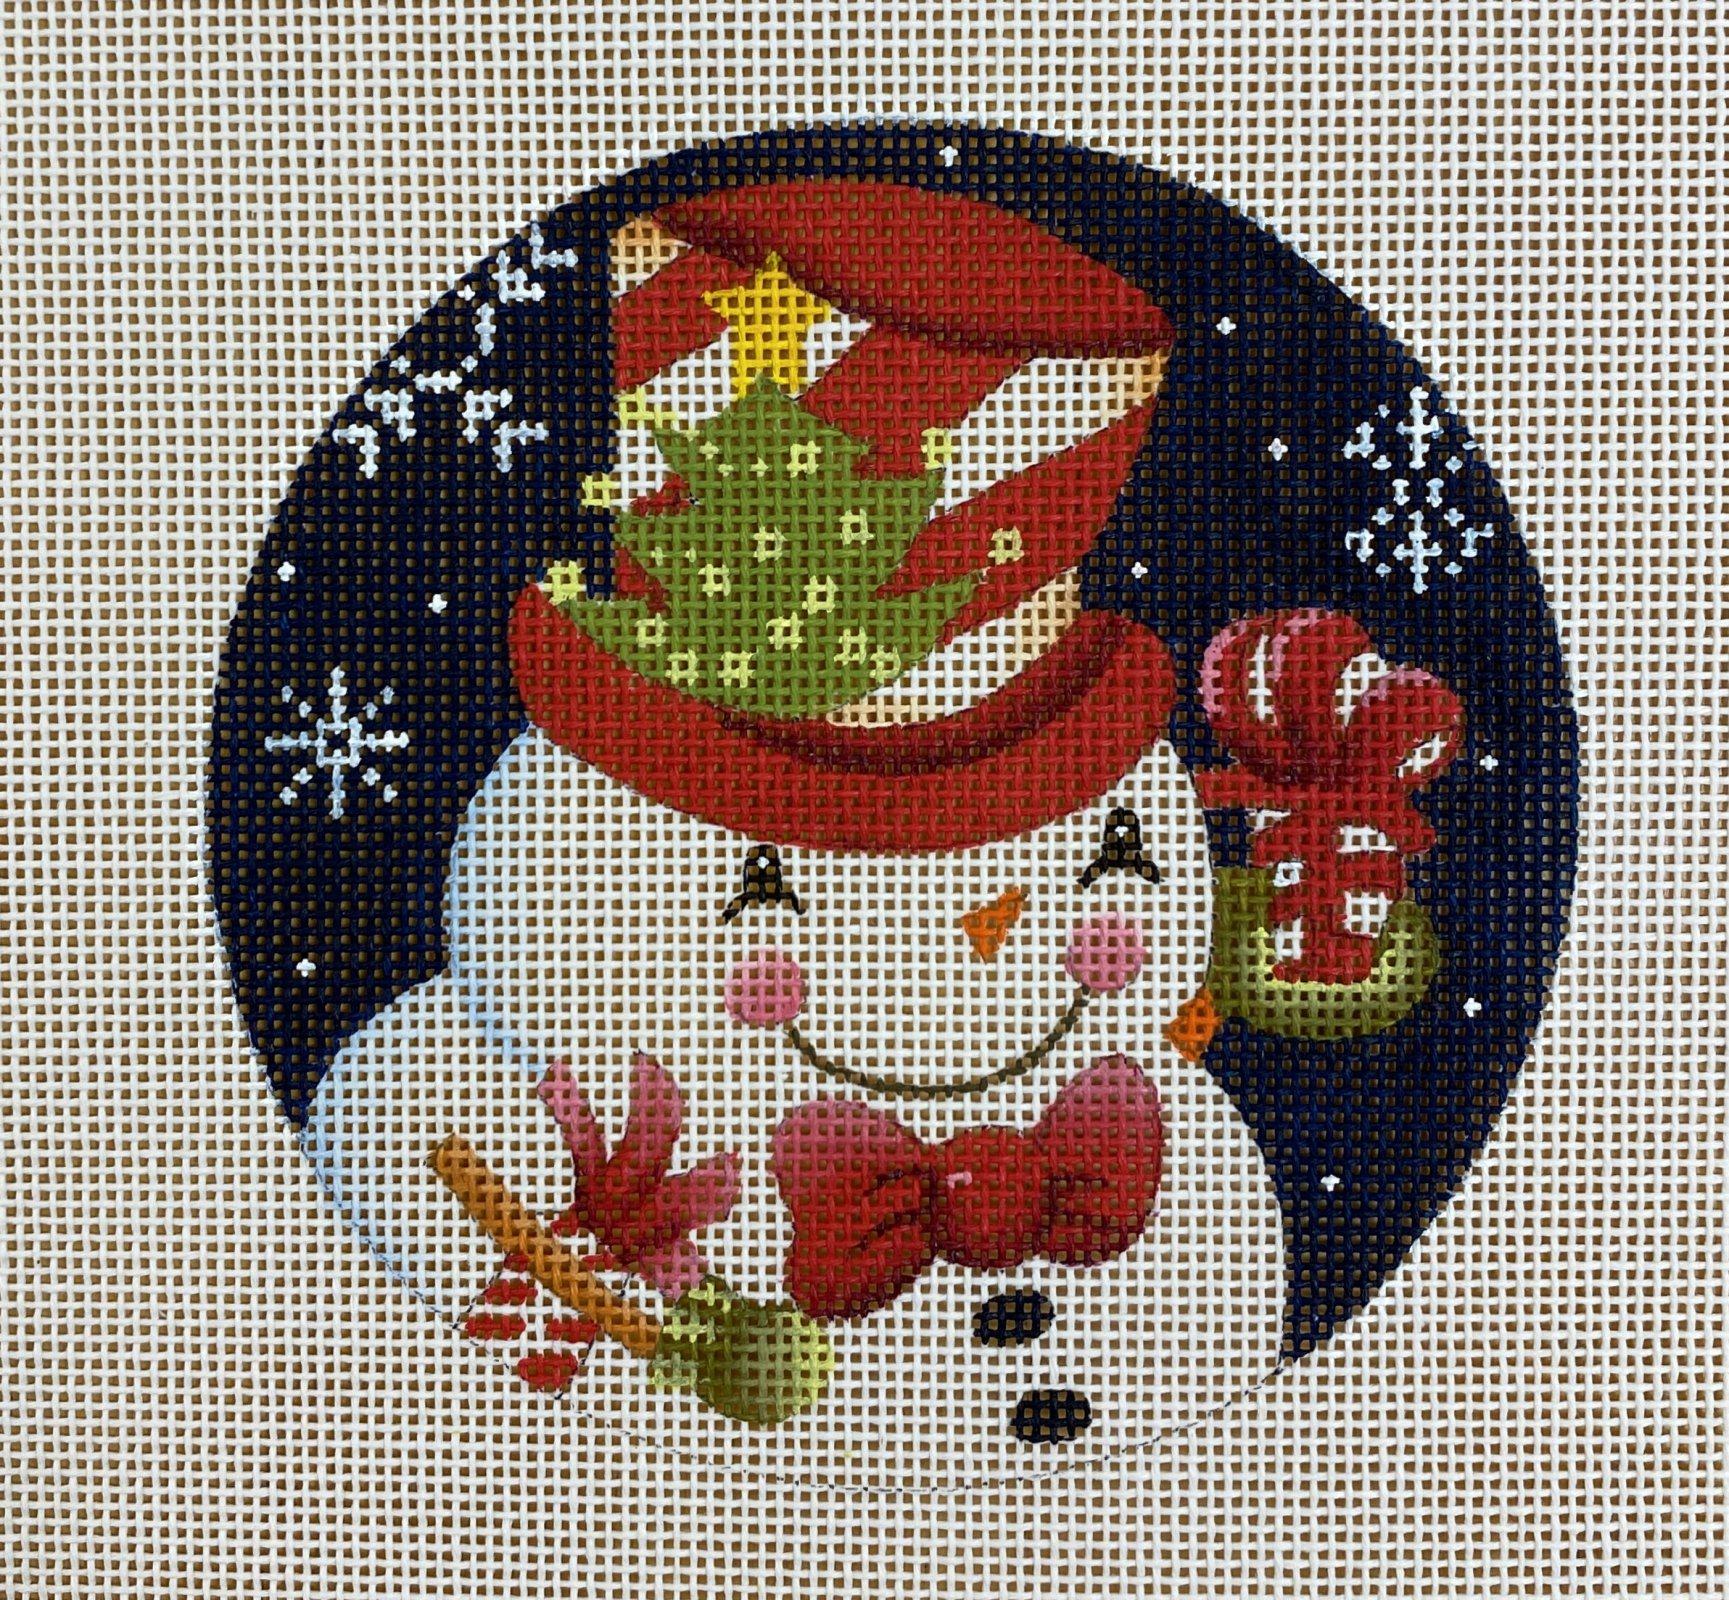 snowman w tree